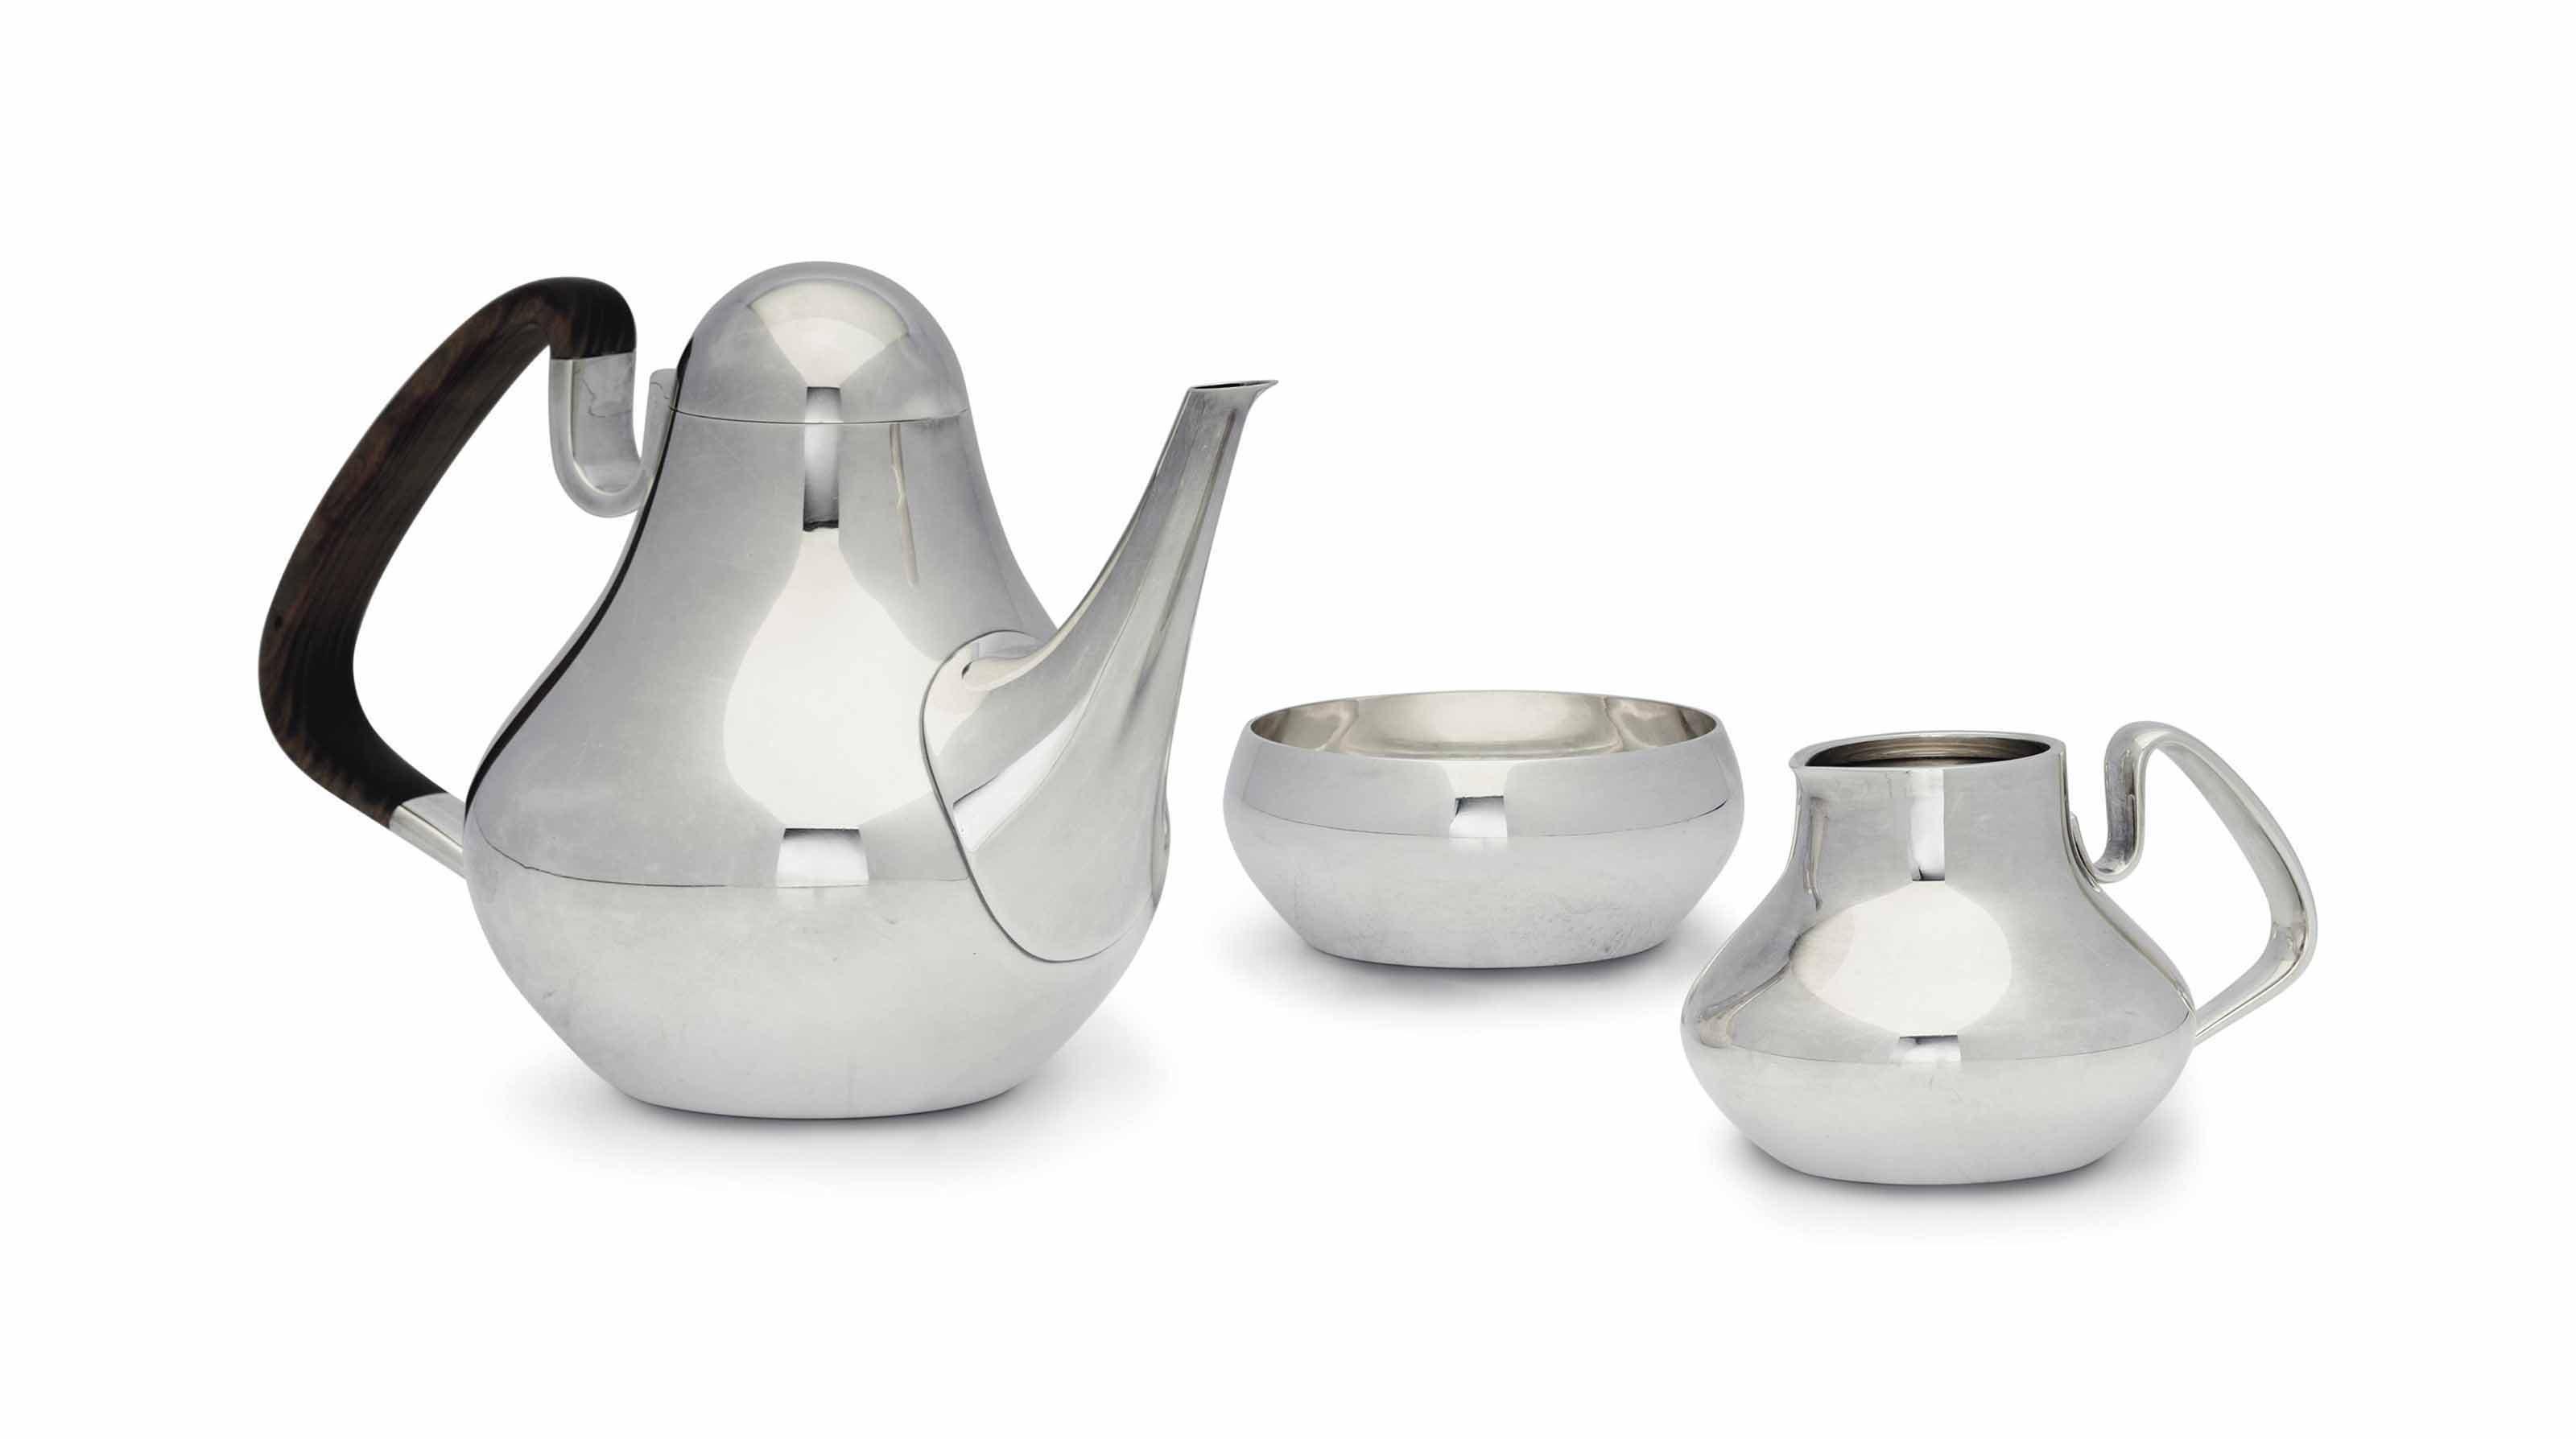 A DANISH SILVER THREE-PIECE TEA SERVICE, DESIGNED BY HENNING KOPPEL